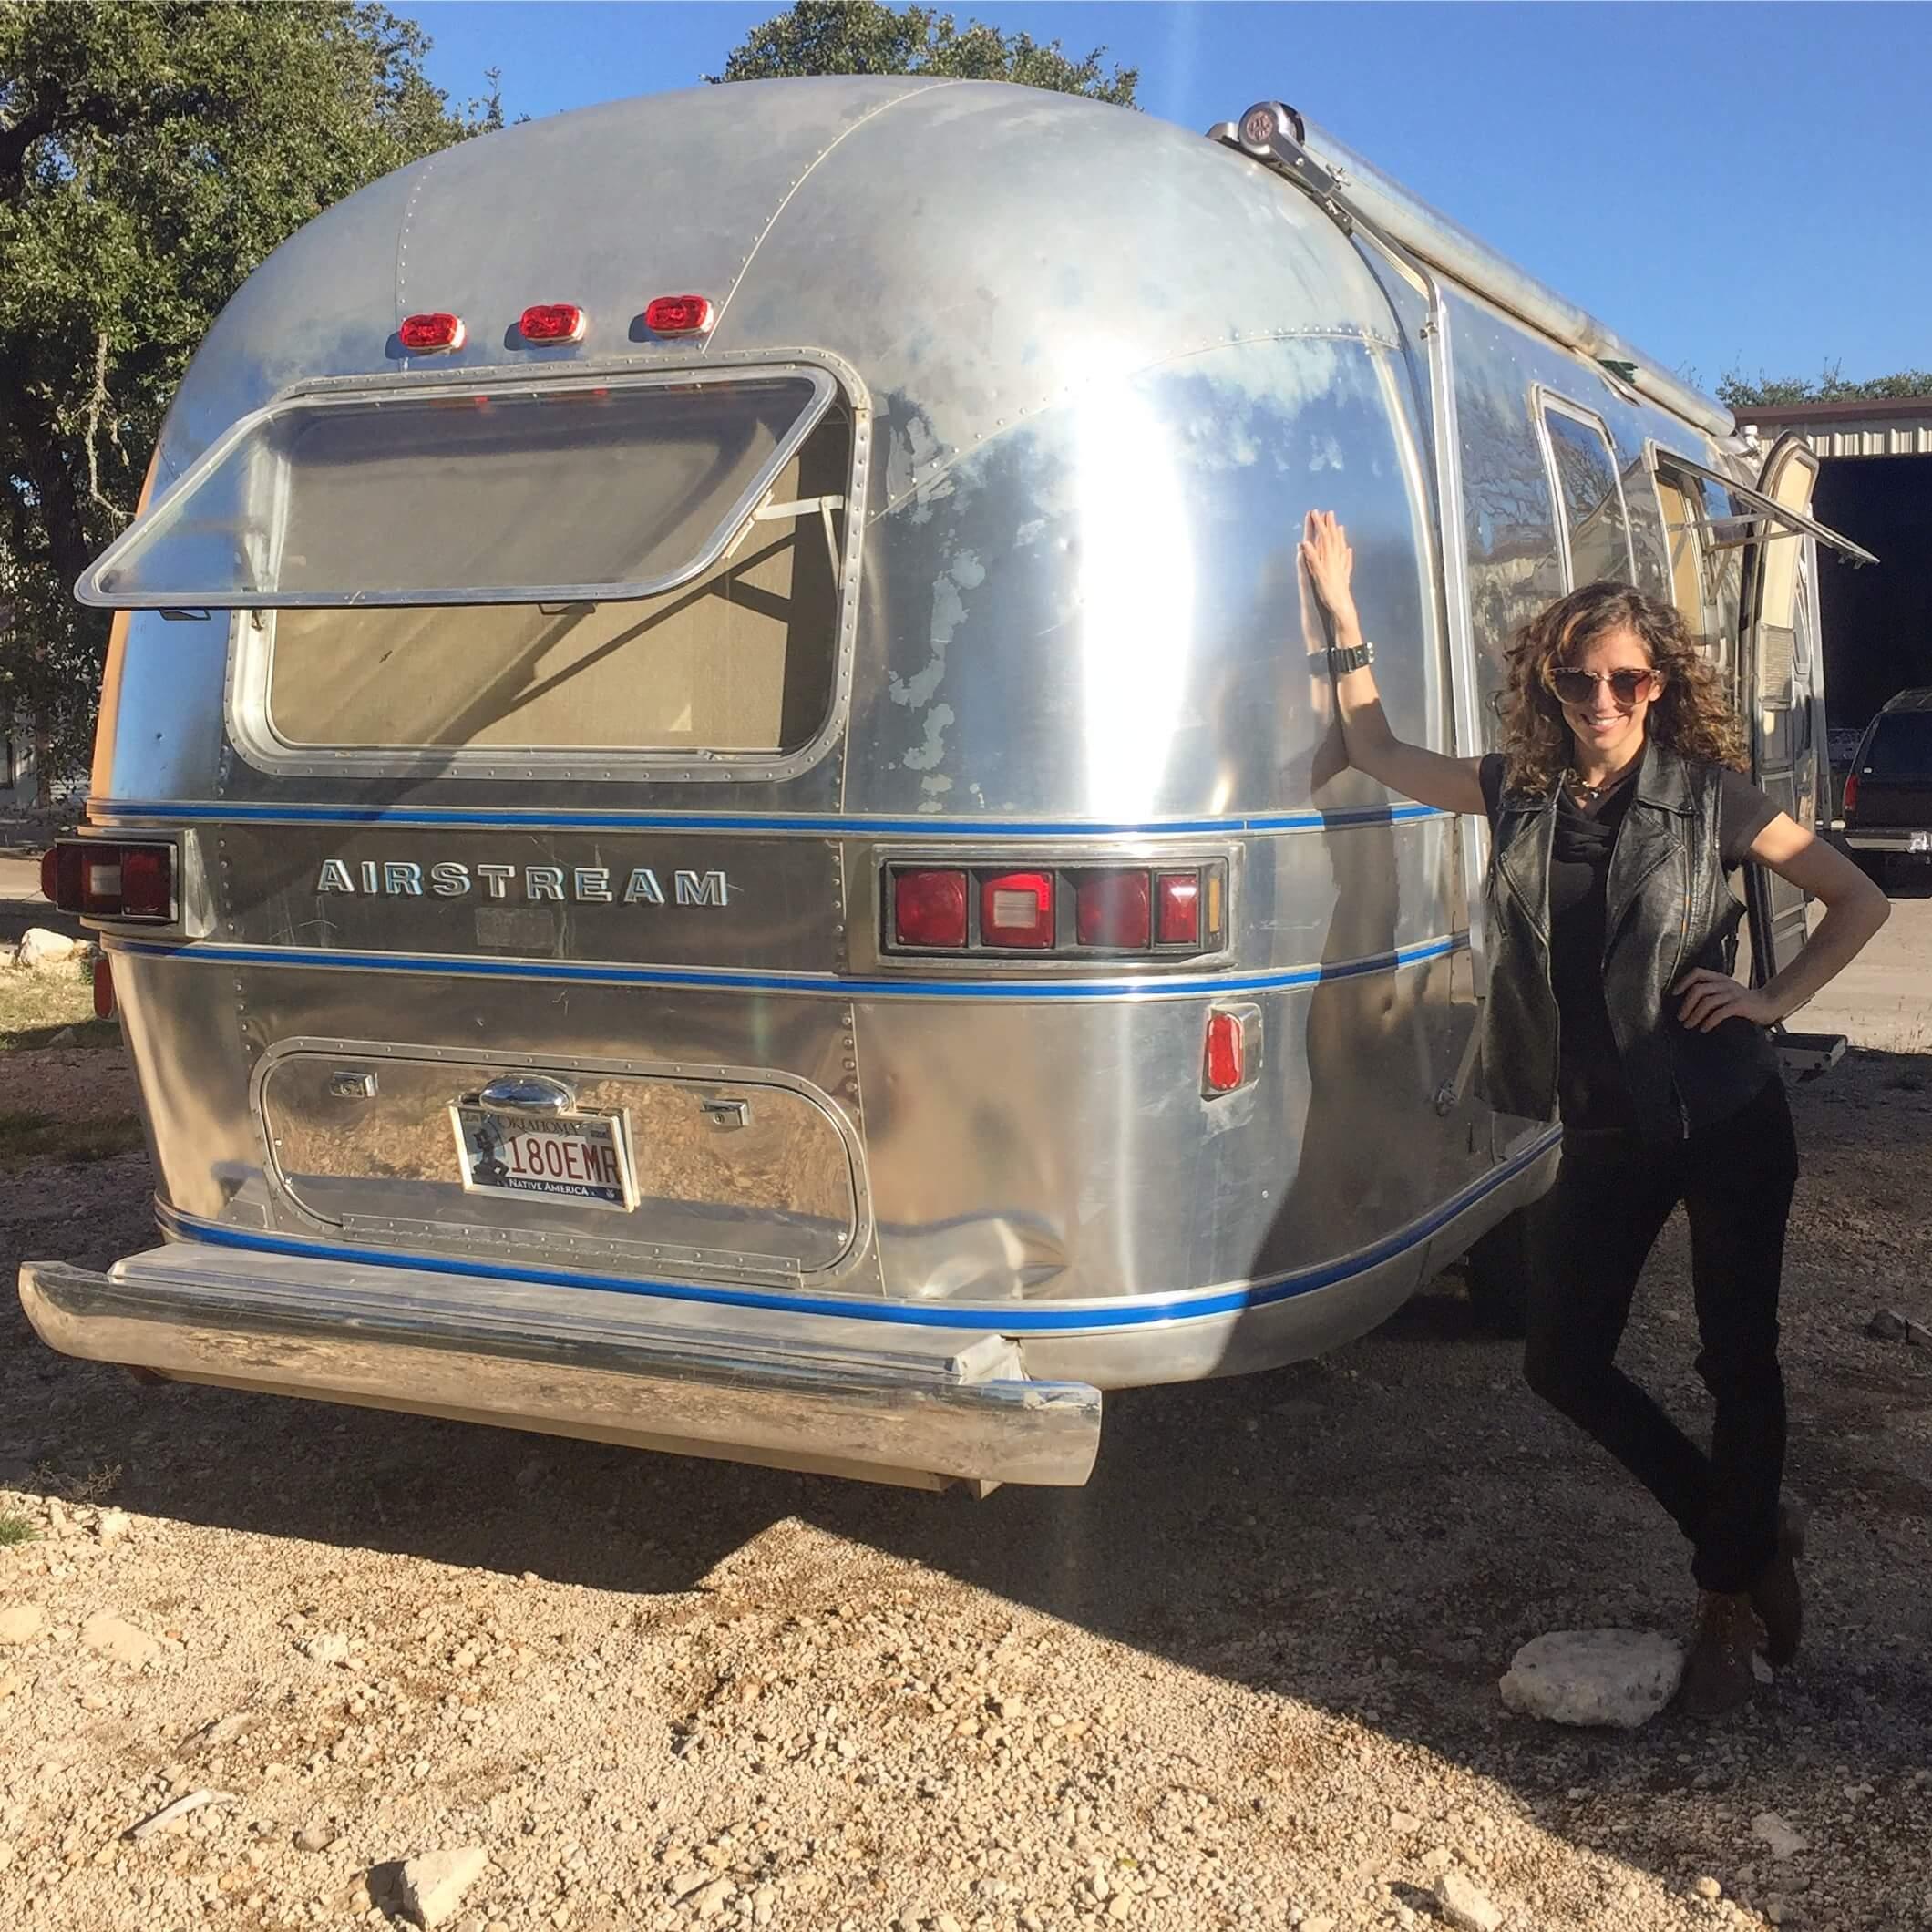 Vacay Vans Lisa Jacobs 1977 Airstream Overlander renovation van life Instagram blog